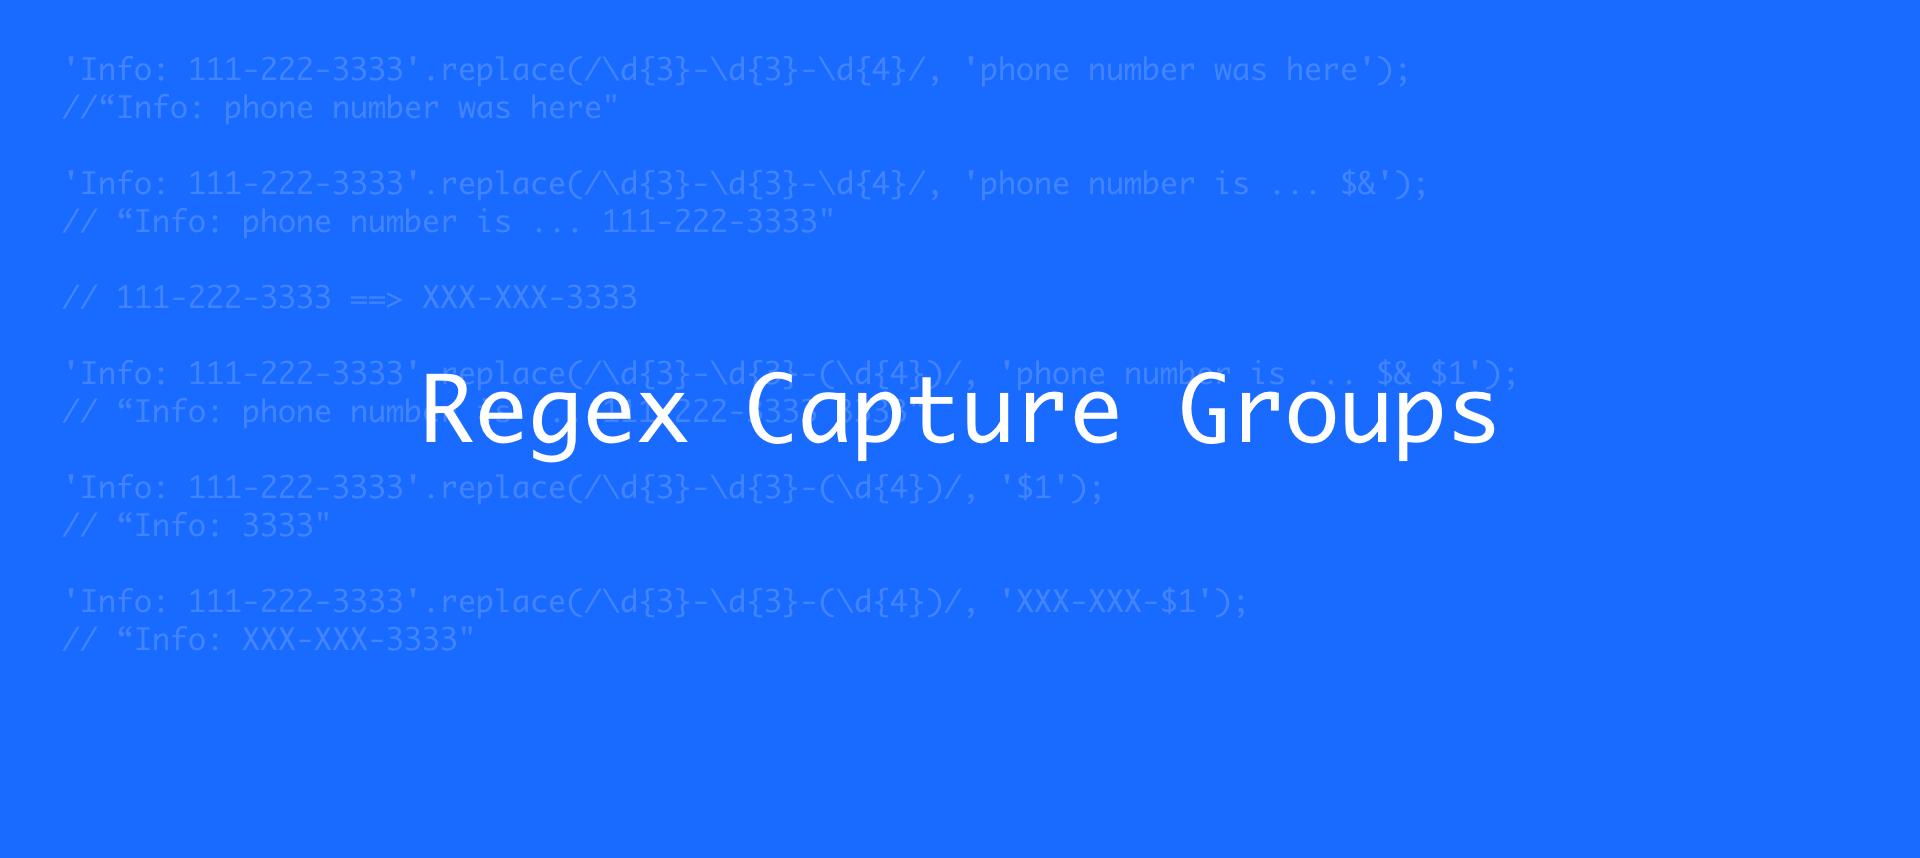 regex-capture-groups@2x.png